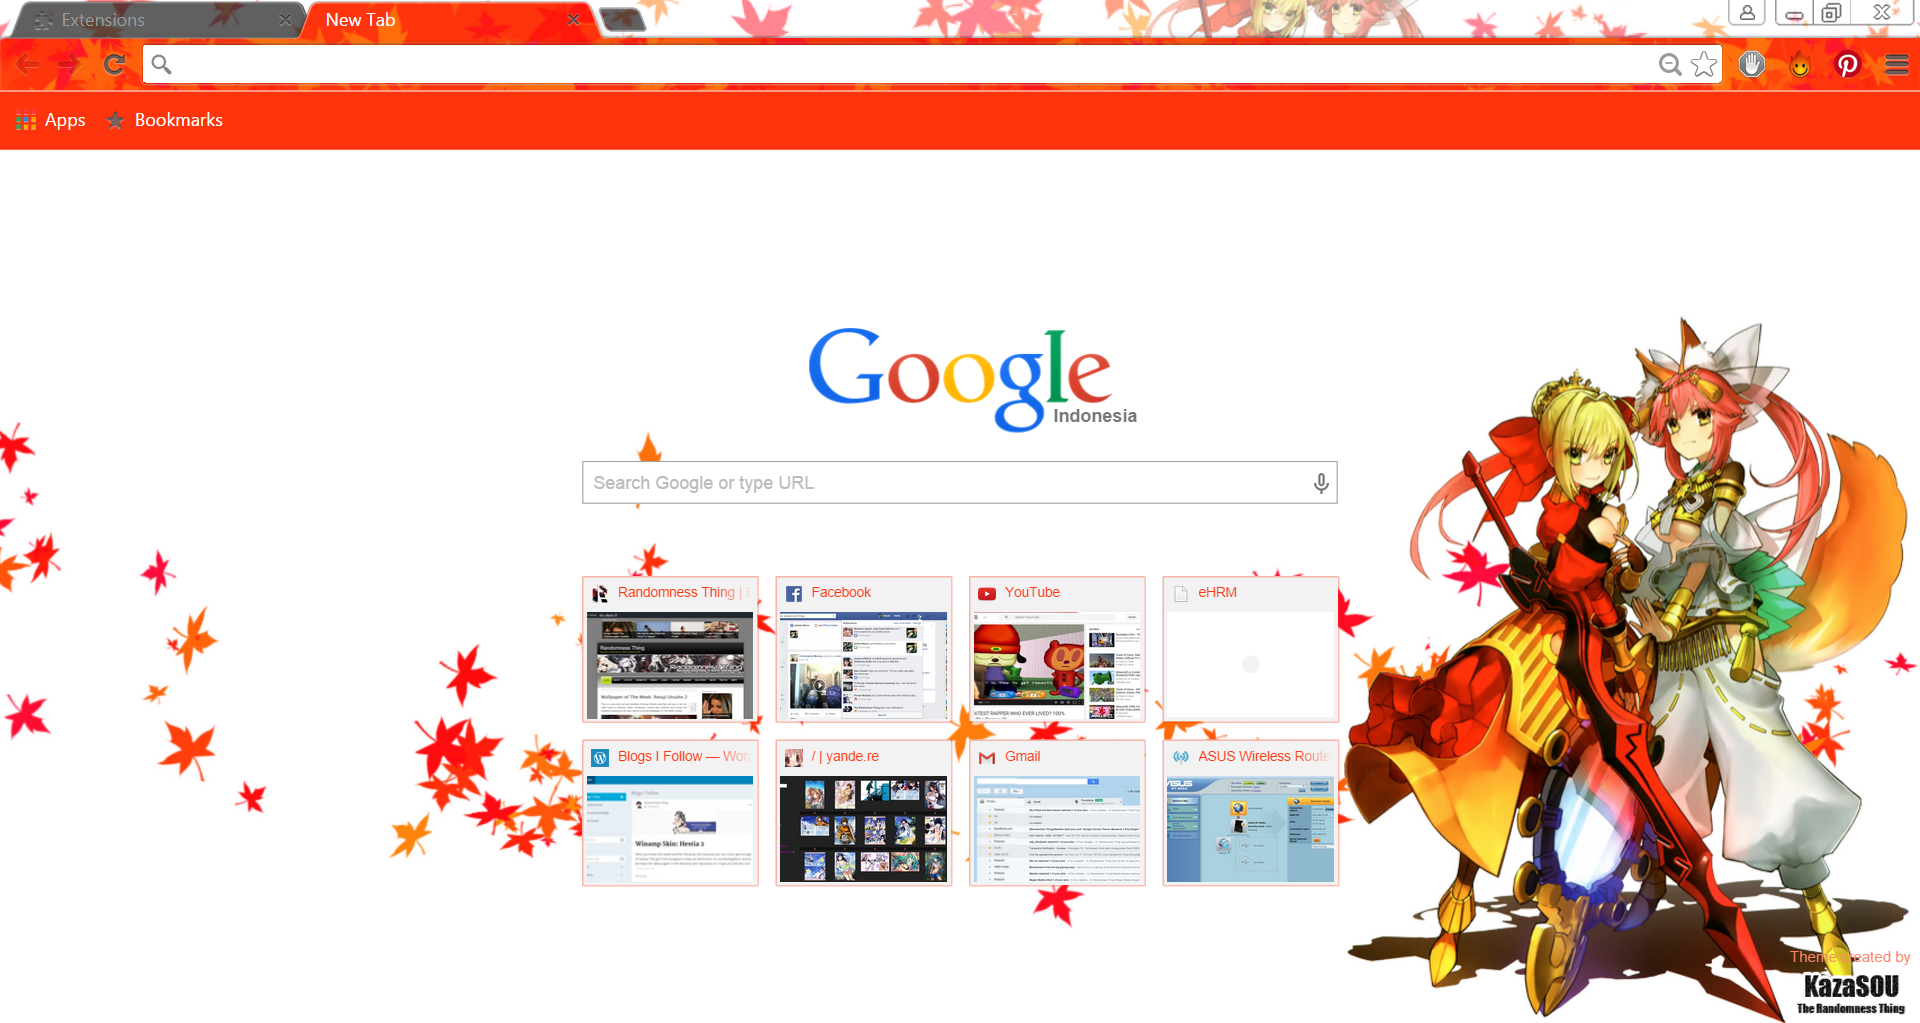 Gmail hatsune miku theme - Saber_caster_chrome